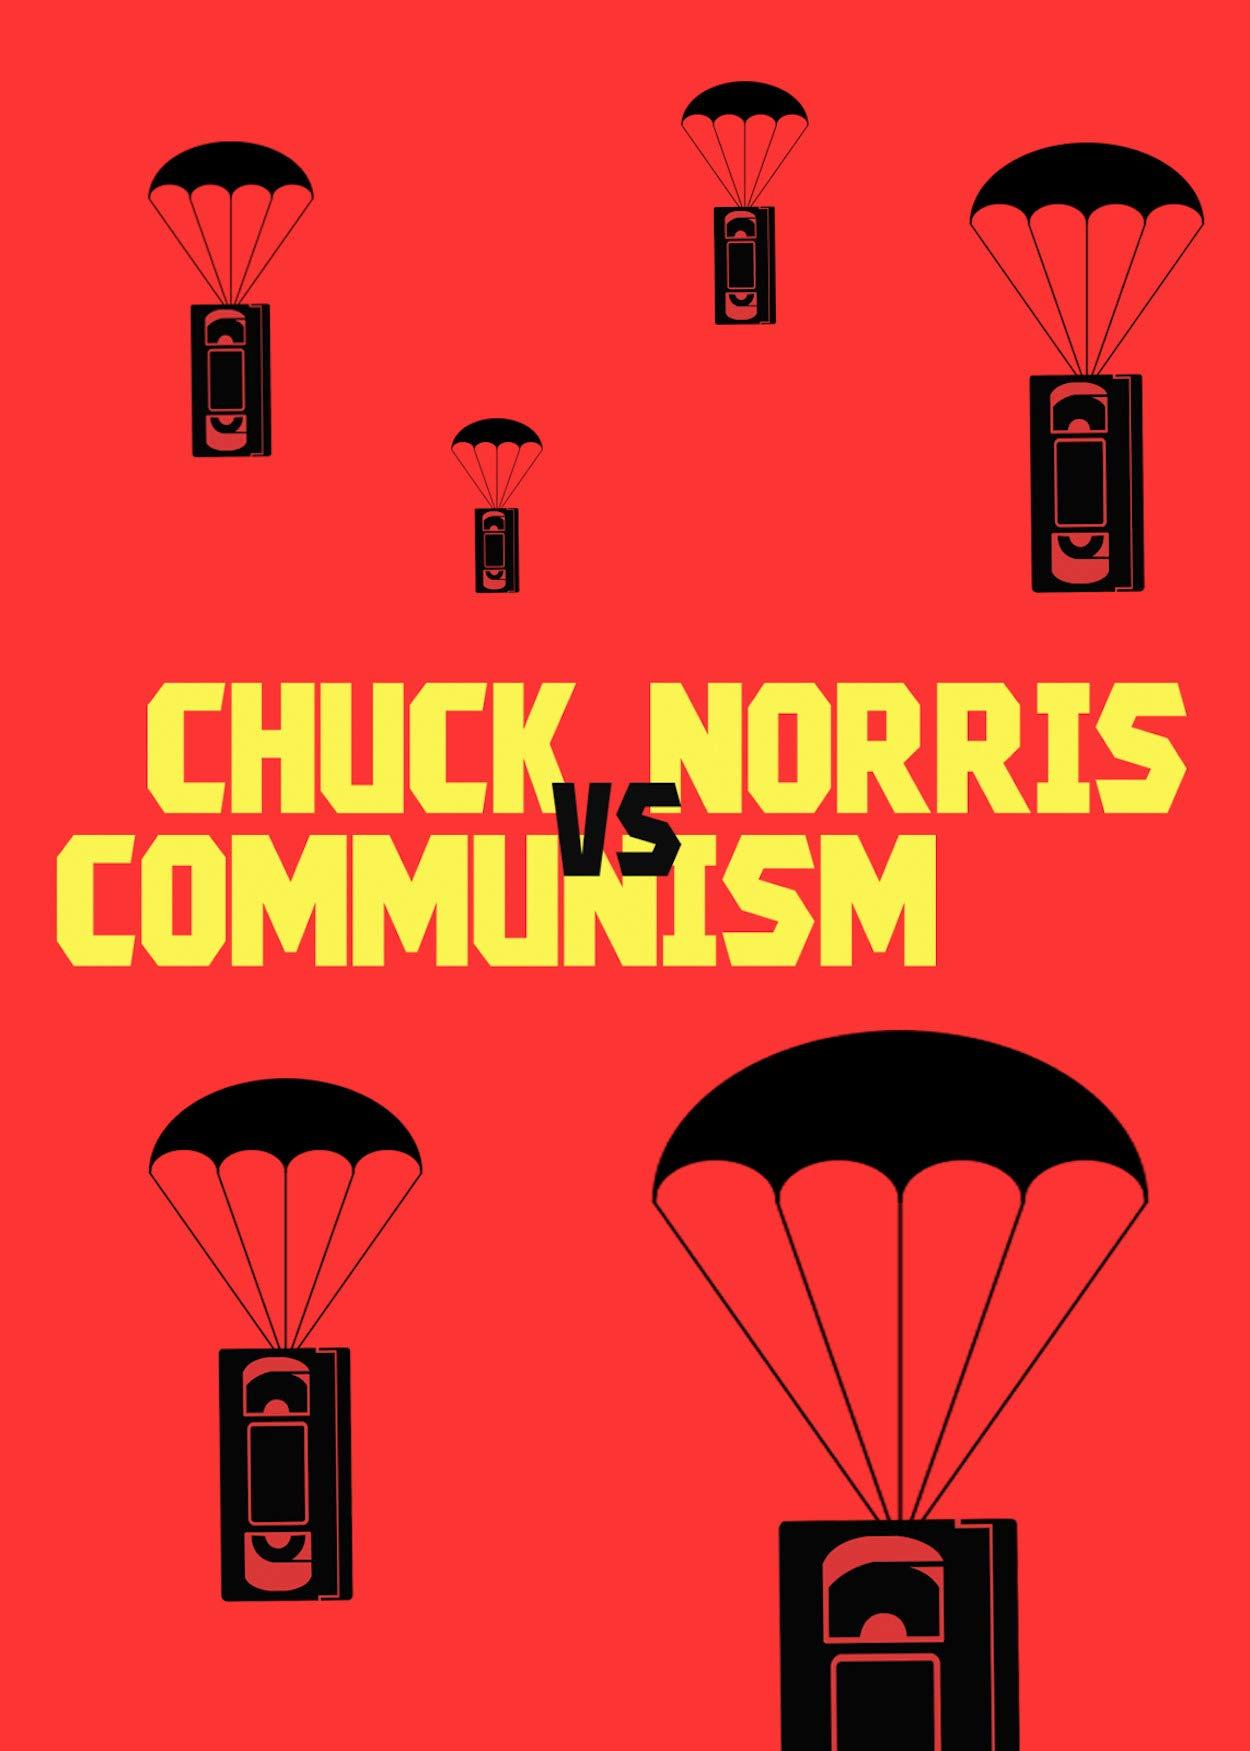 Chuck Norris vs. Communism (2015) - IMDb